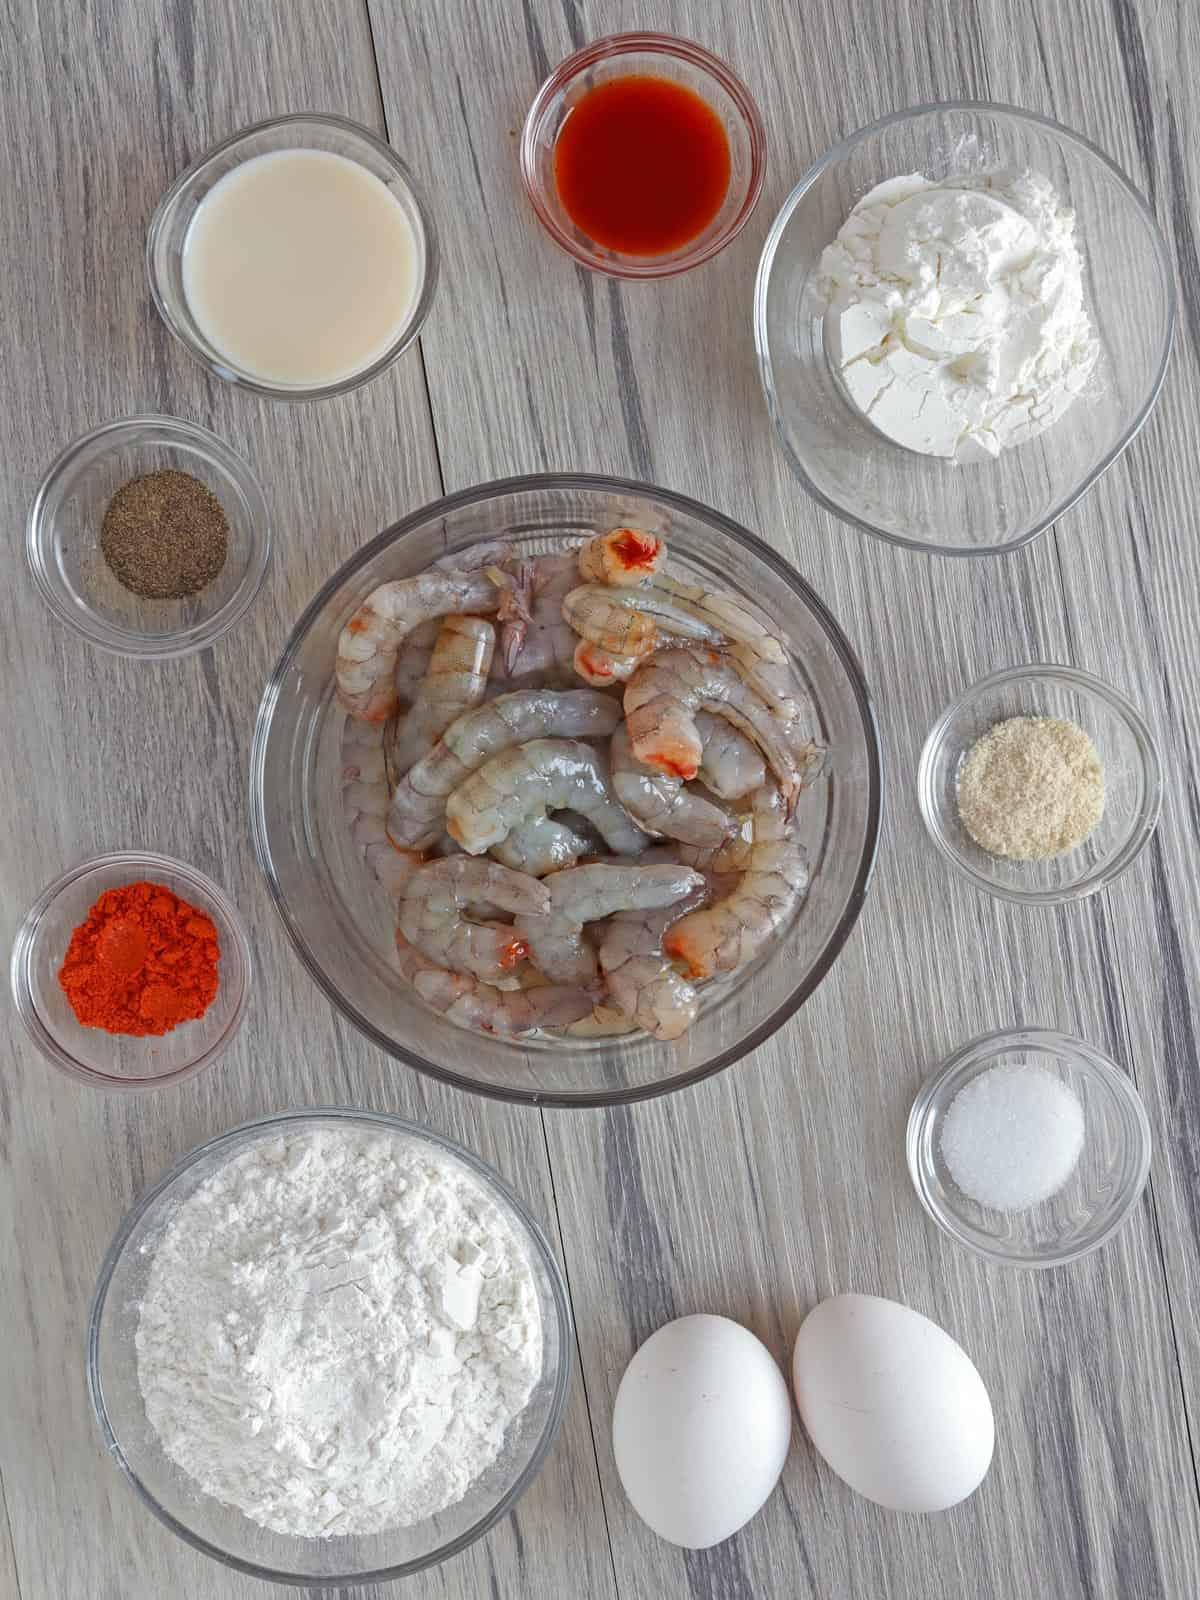 peeled shrimp, cornstarch, flour, eggs, seasonings, and milk in individual glass bowls